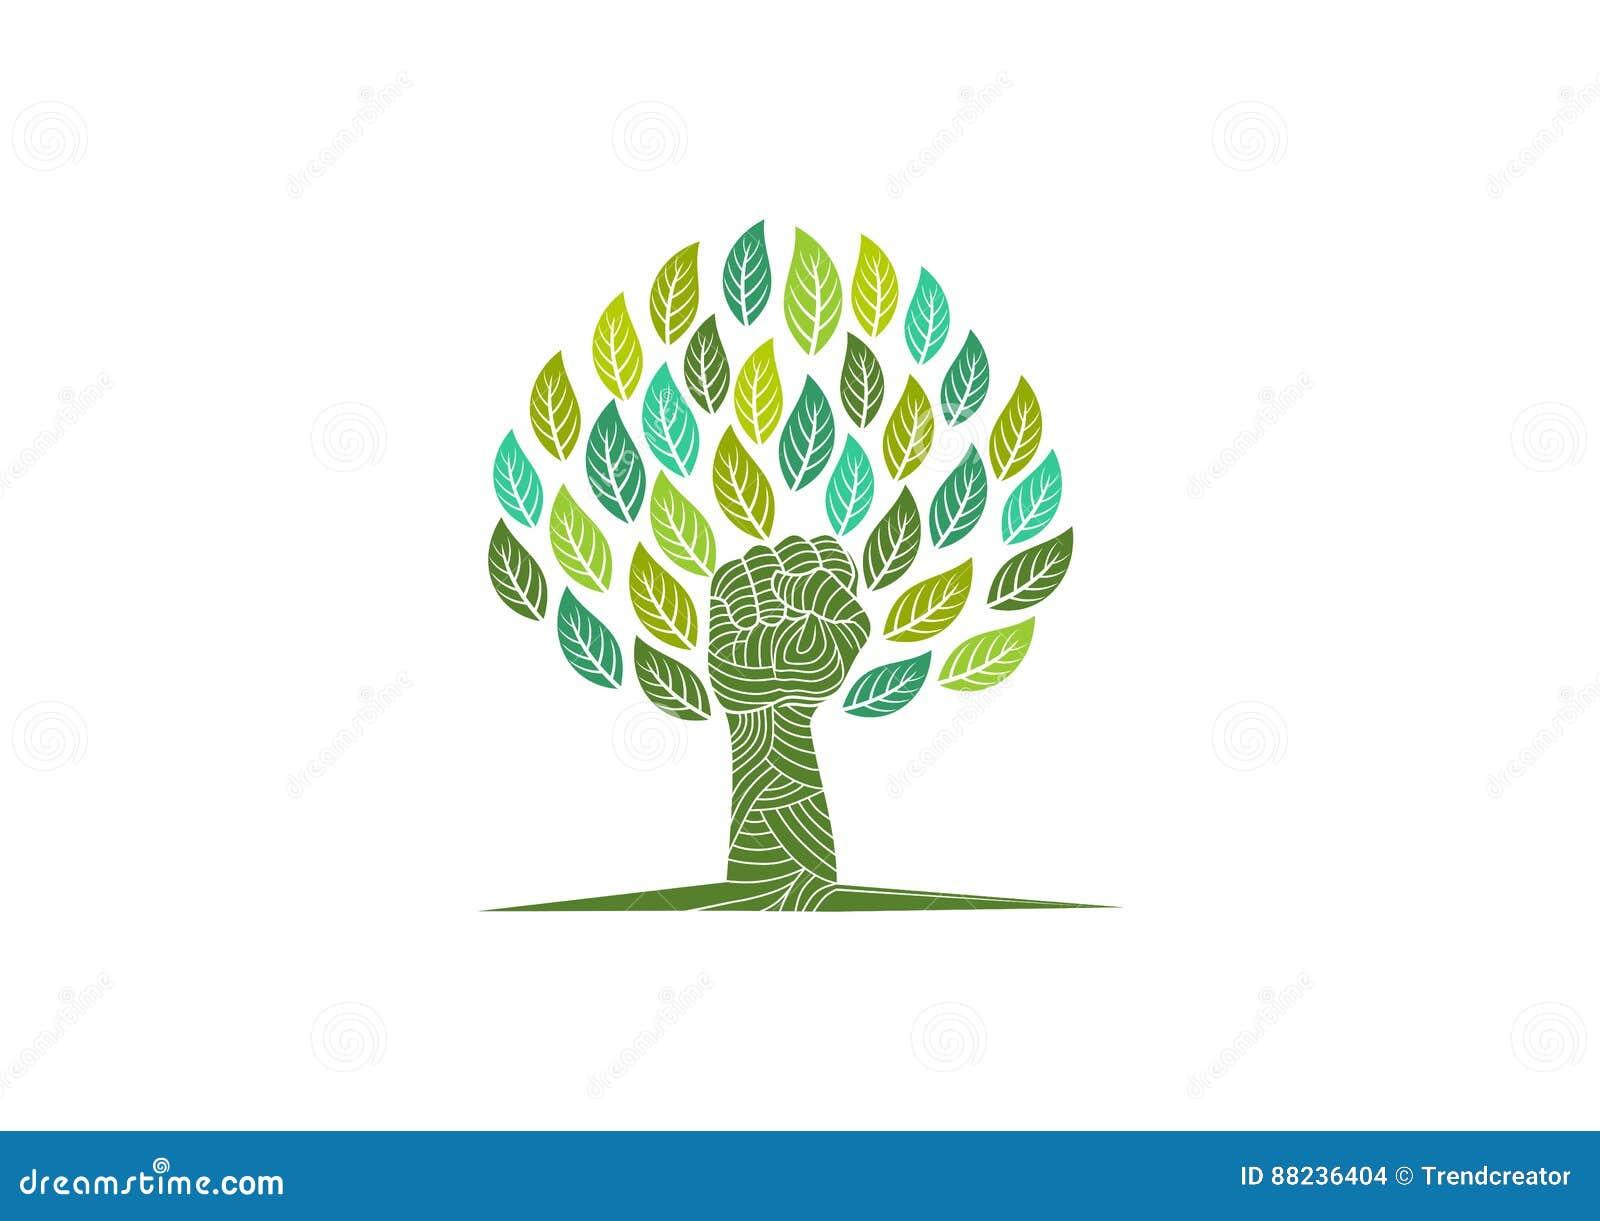 Tree Care Logo Revolution Nature Symbol Organic Rebellion Sign